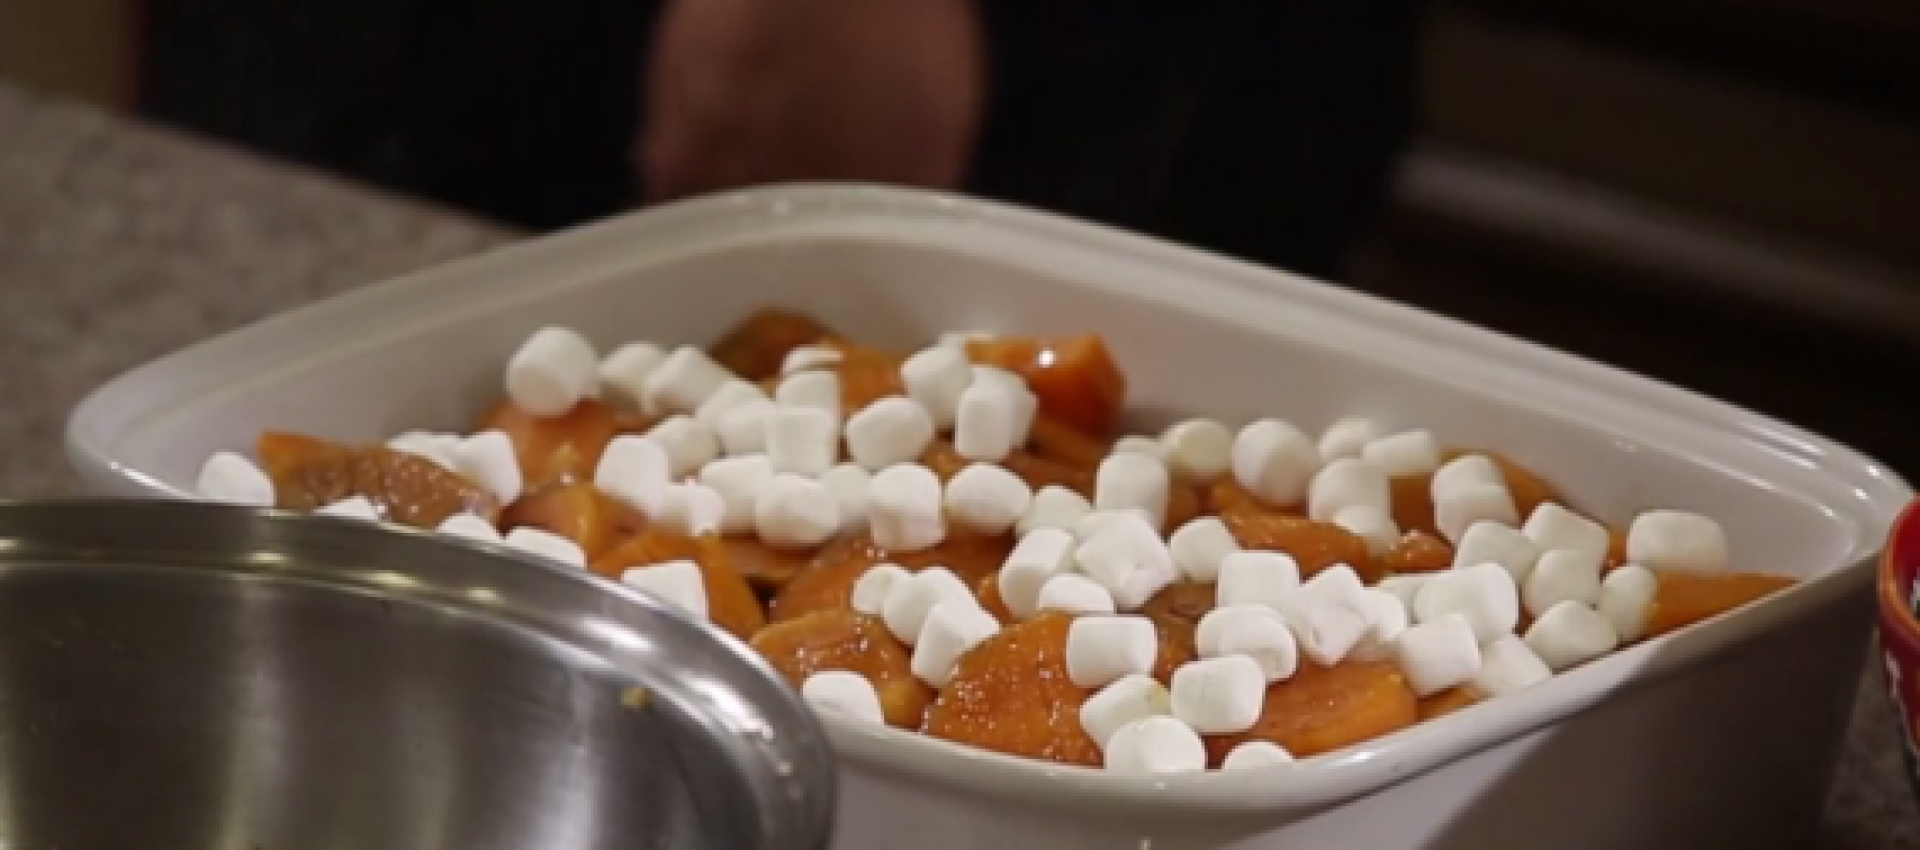 Sweet Potatoes and Marshmallow Casserole Image